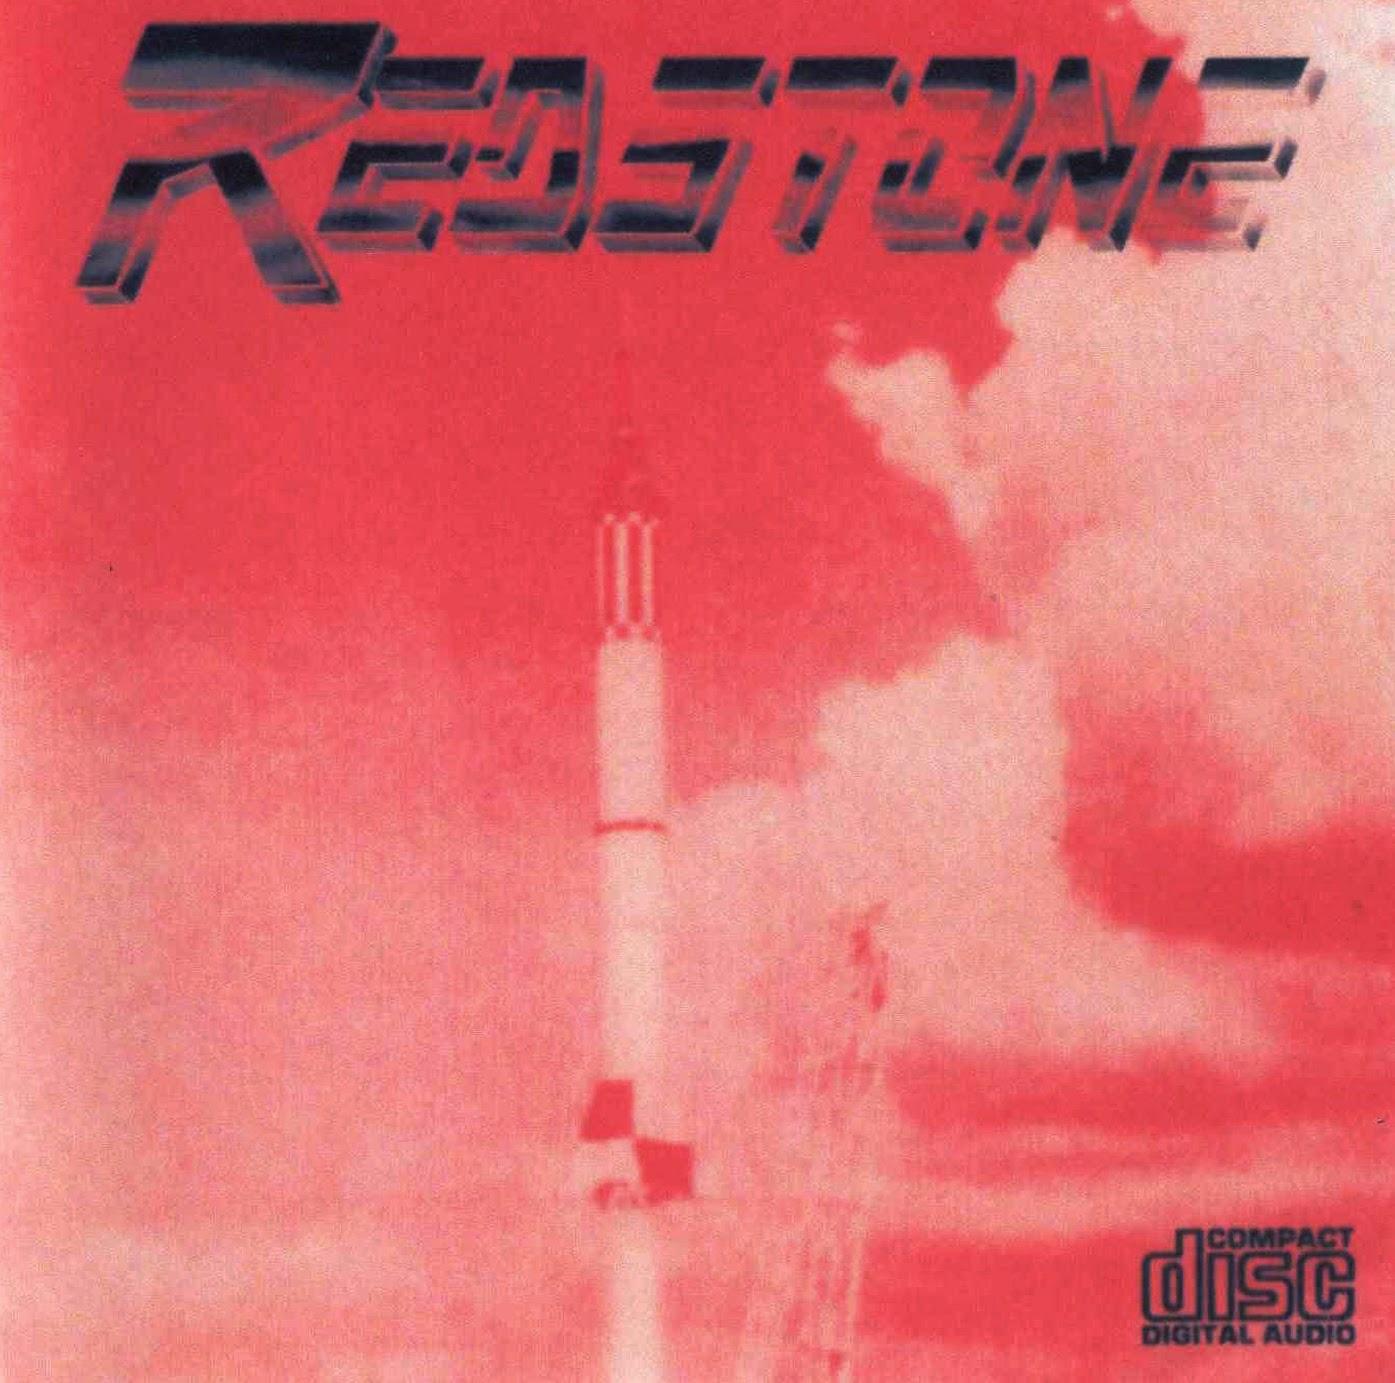 Redstone st 1988